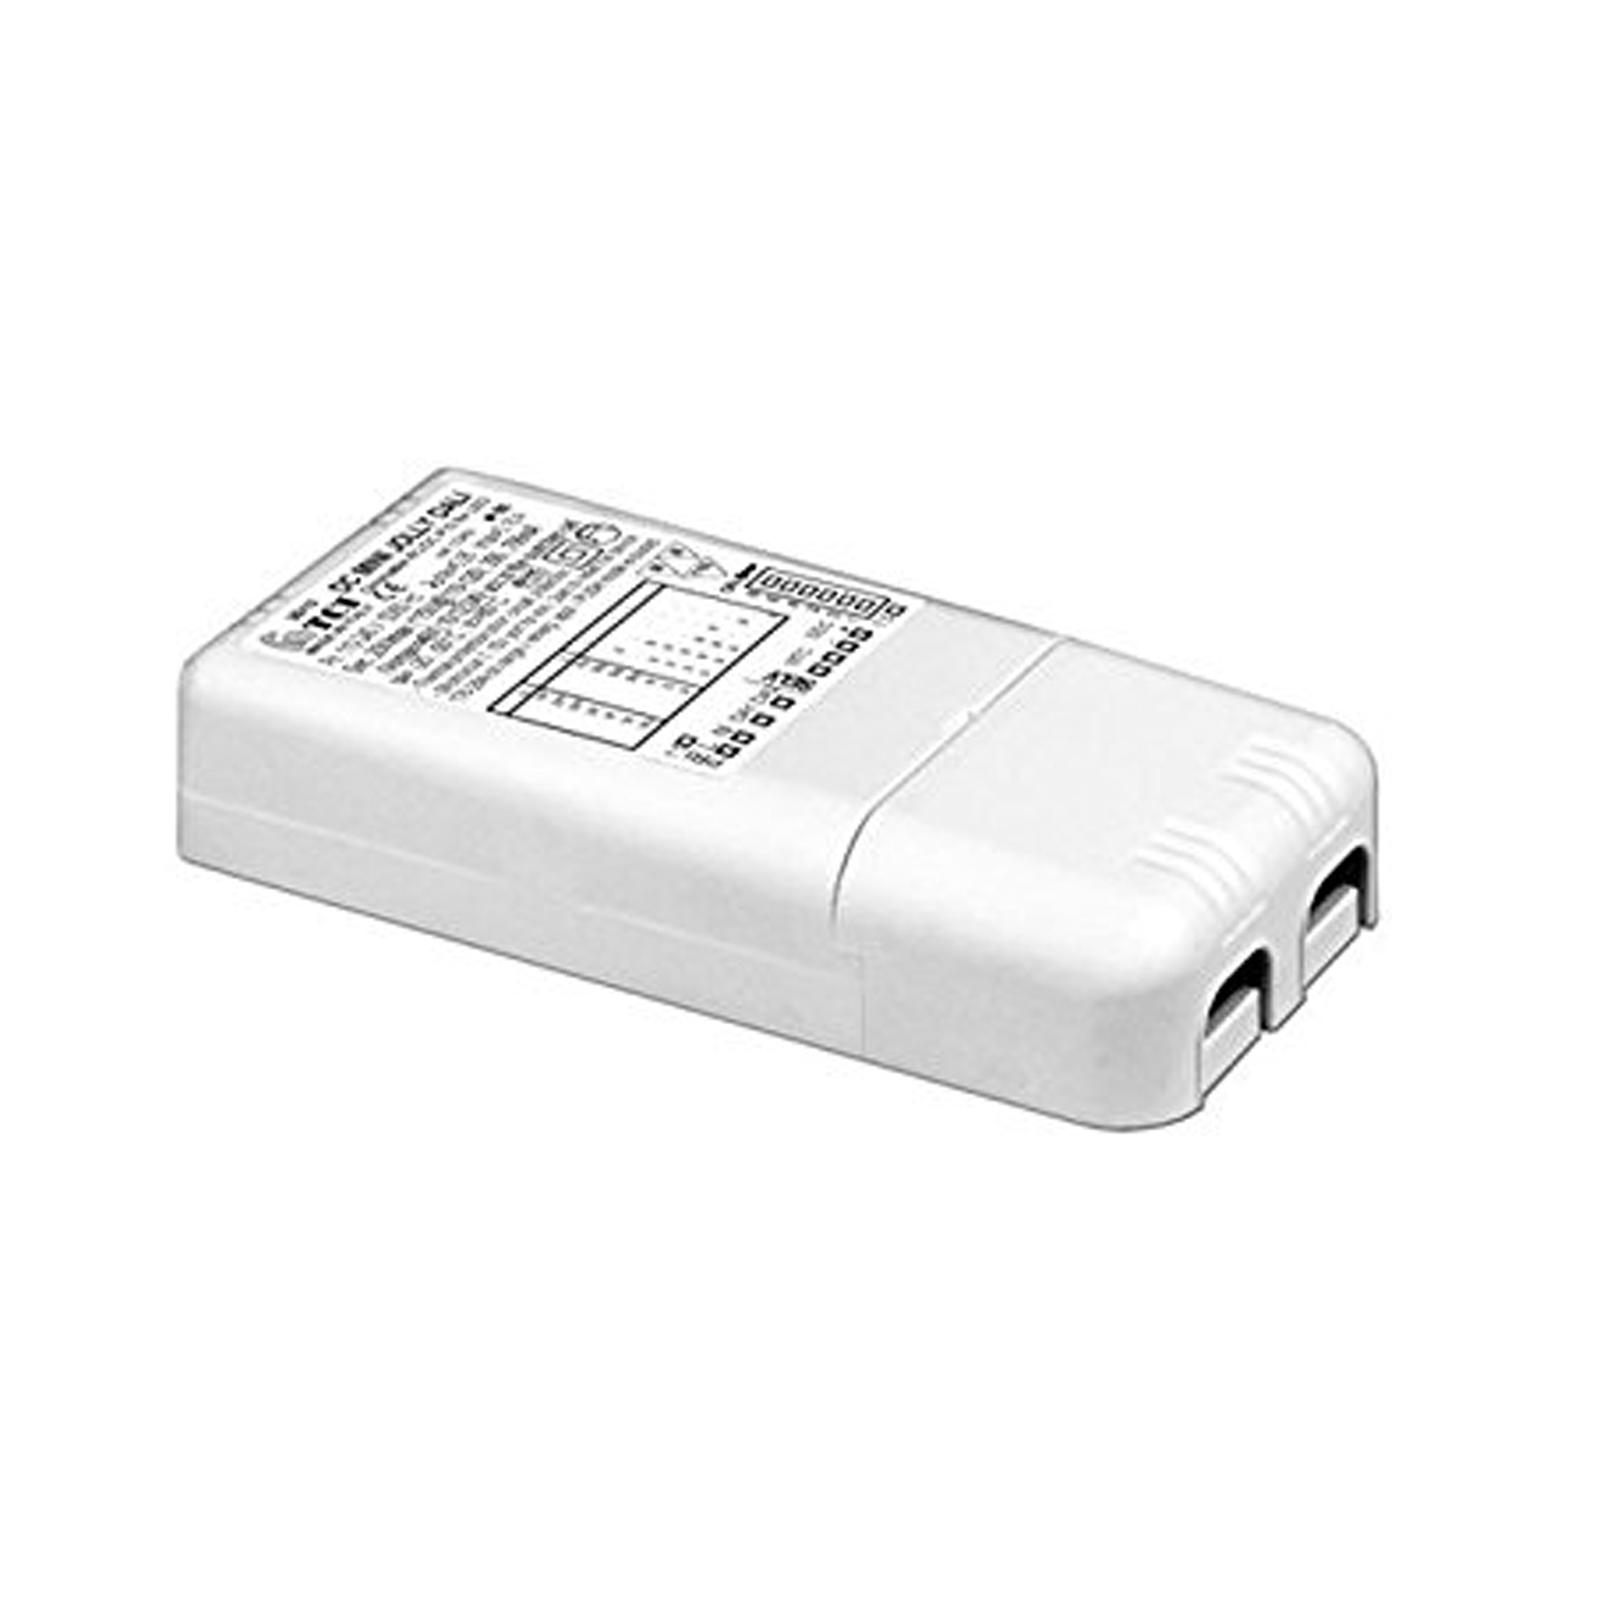 LED-Netzgerät 6301-04-068 20W dimmbar